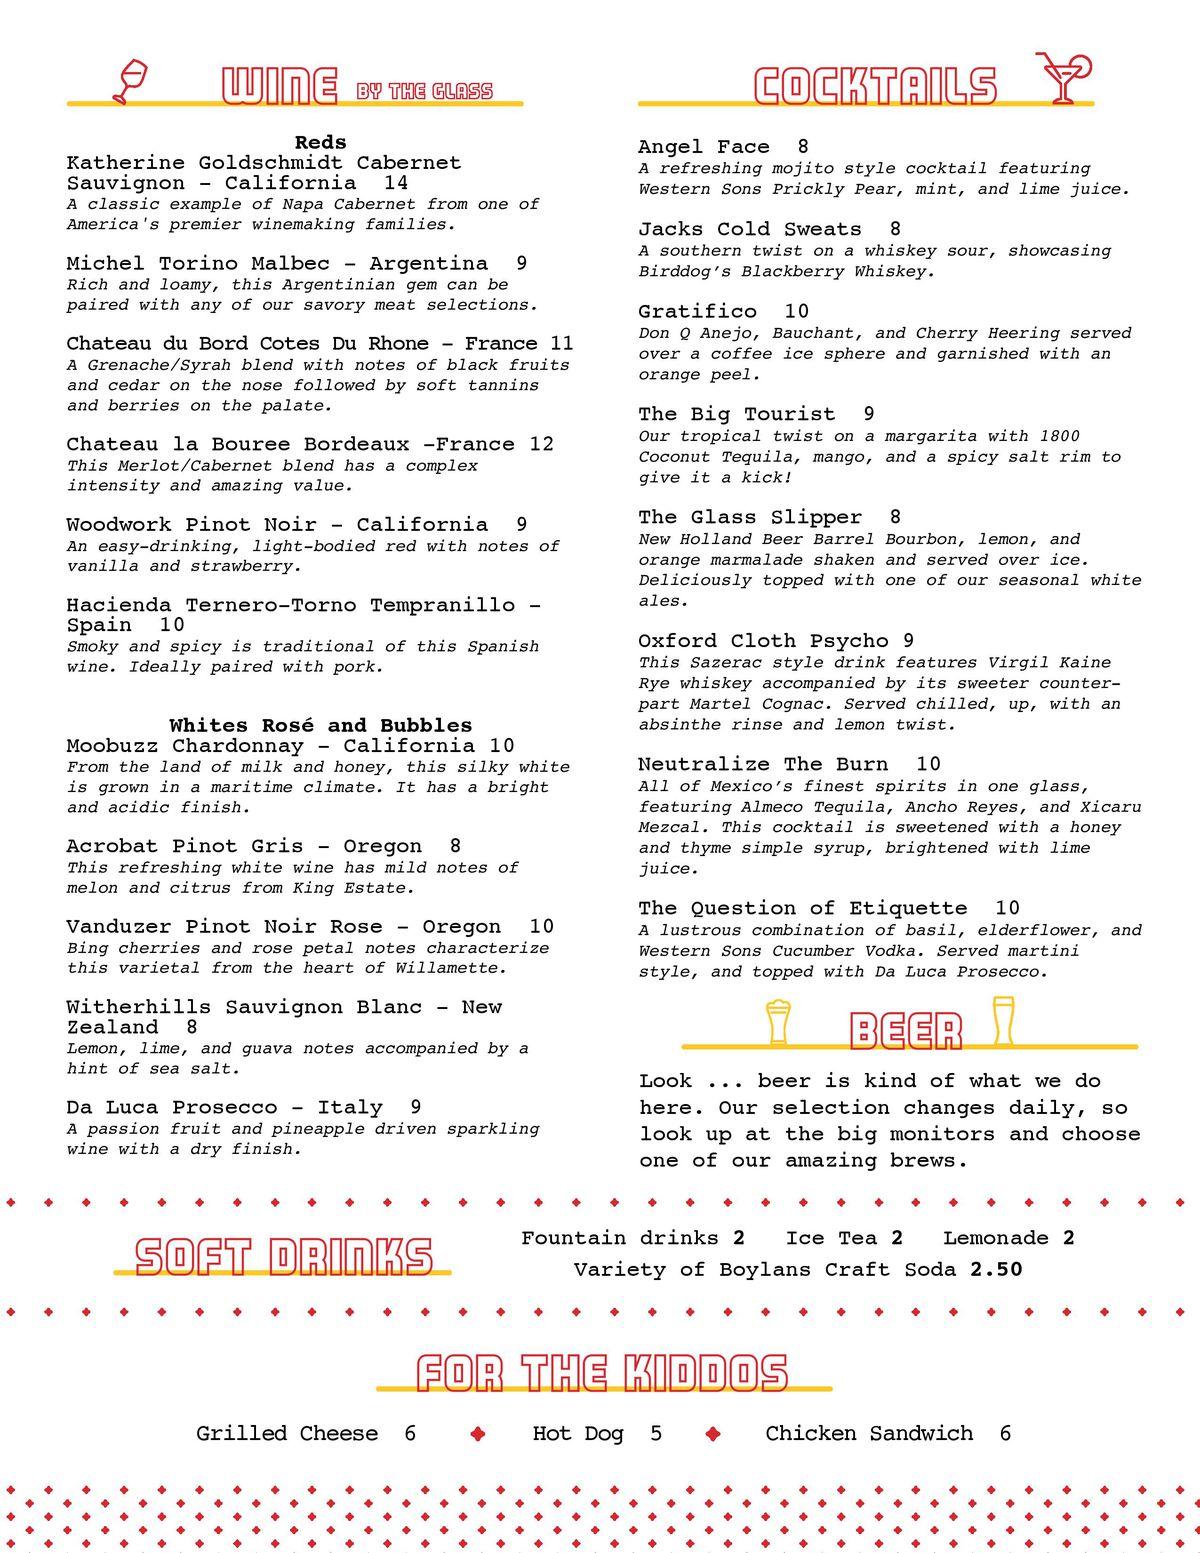 Barleygarden drink menu